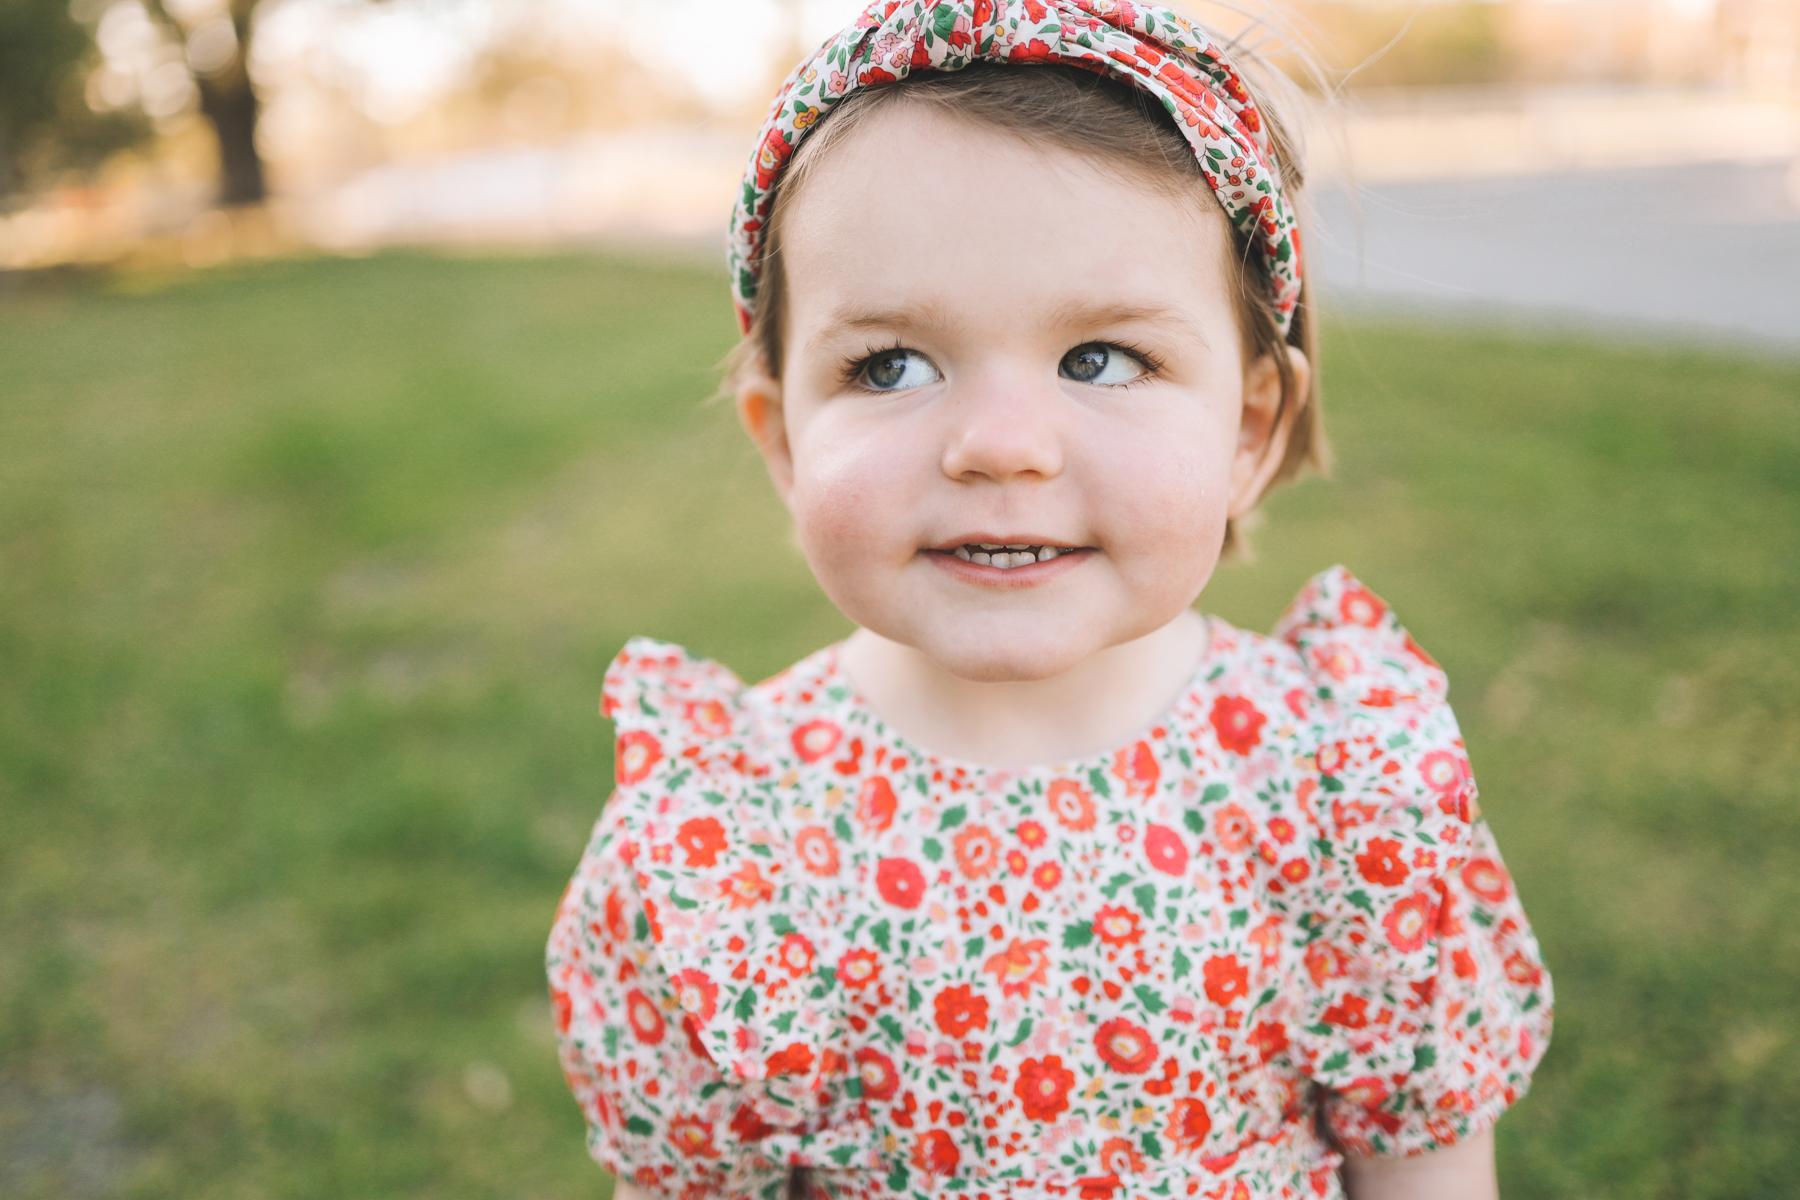 toddler j.crew floral dress | Under the Oak Trees